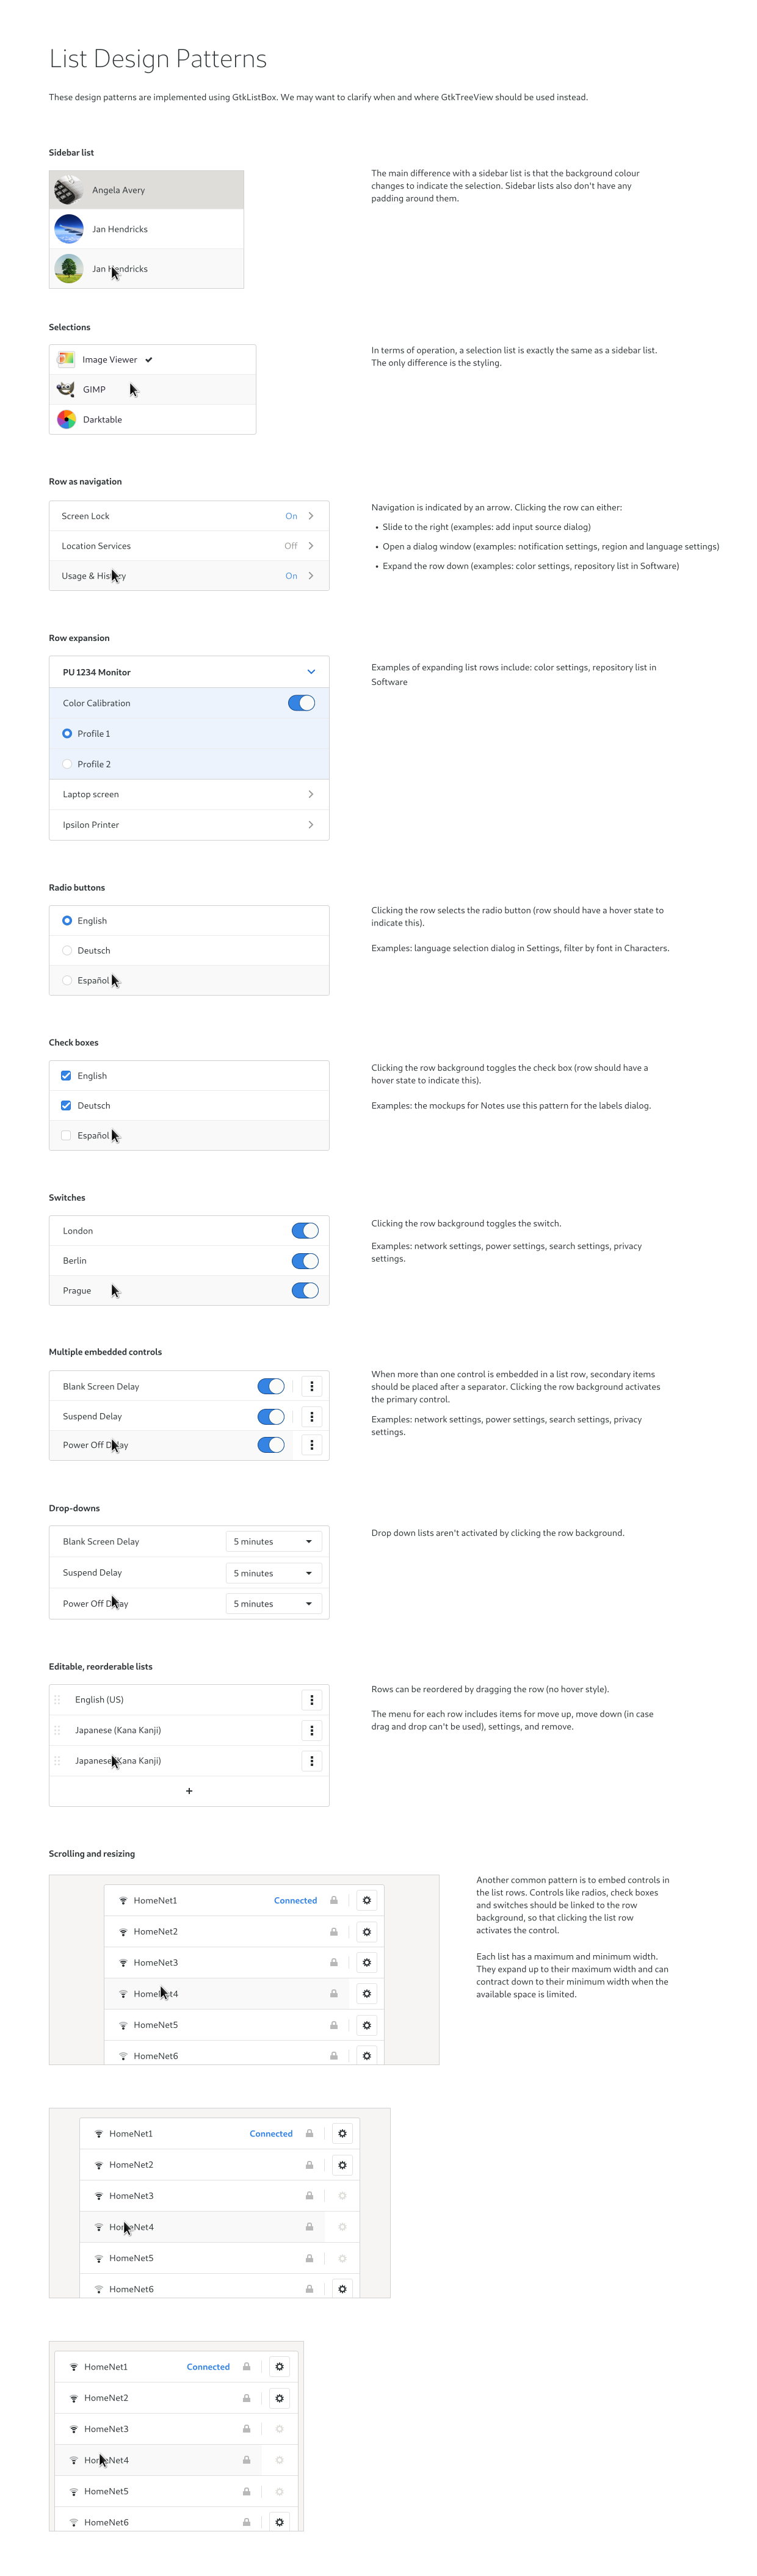 lists/list-design-patterns.png